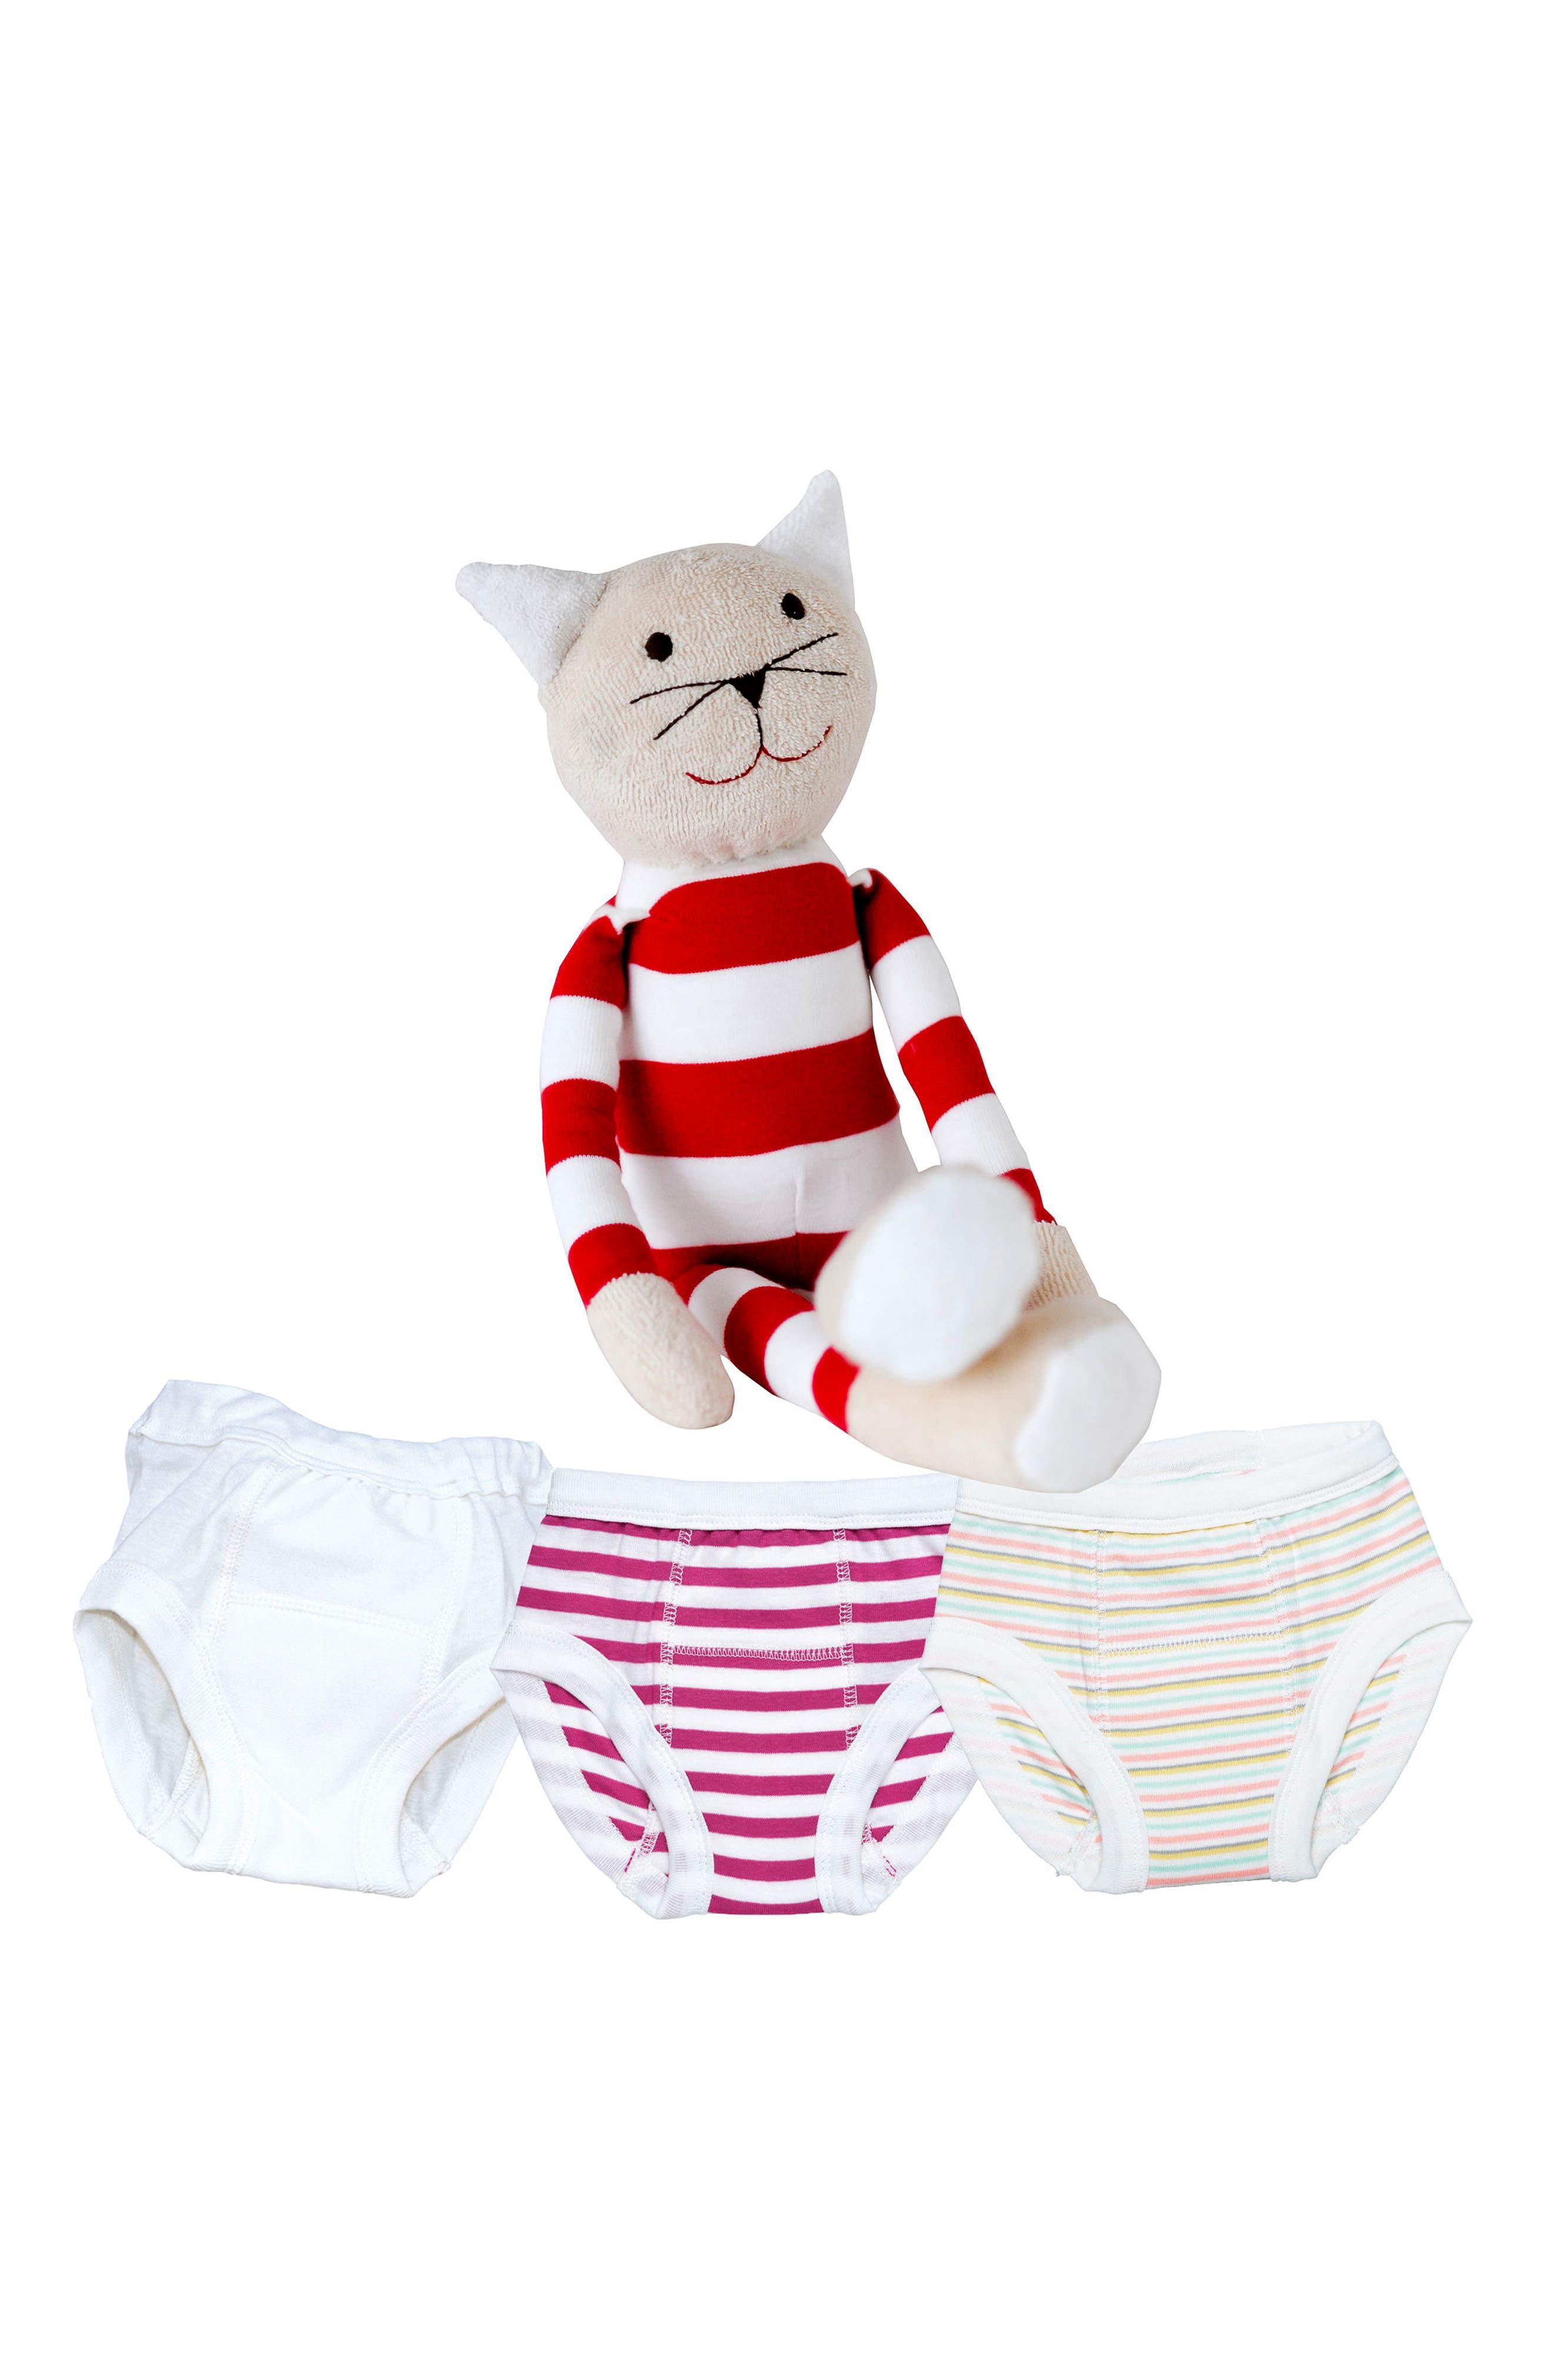 4-Piece Training Pants & Tilly Stuffed Animal Set,                             Main thumbnail 1, color,                             PINK